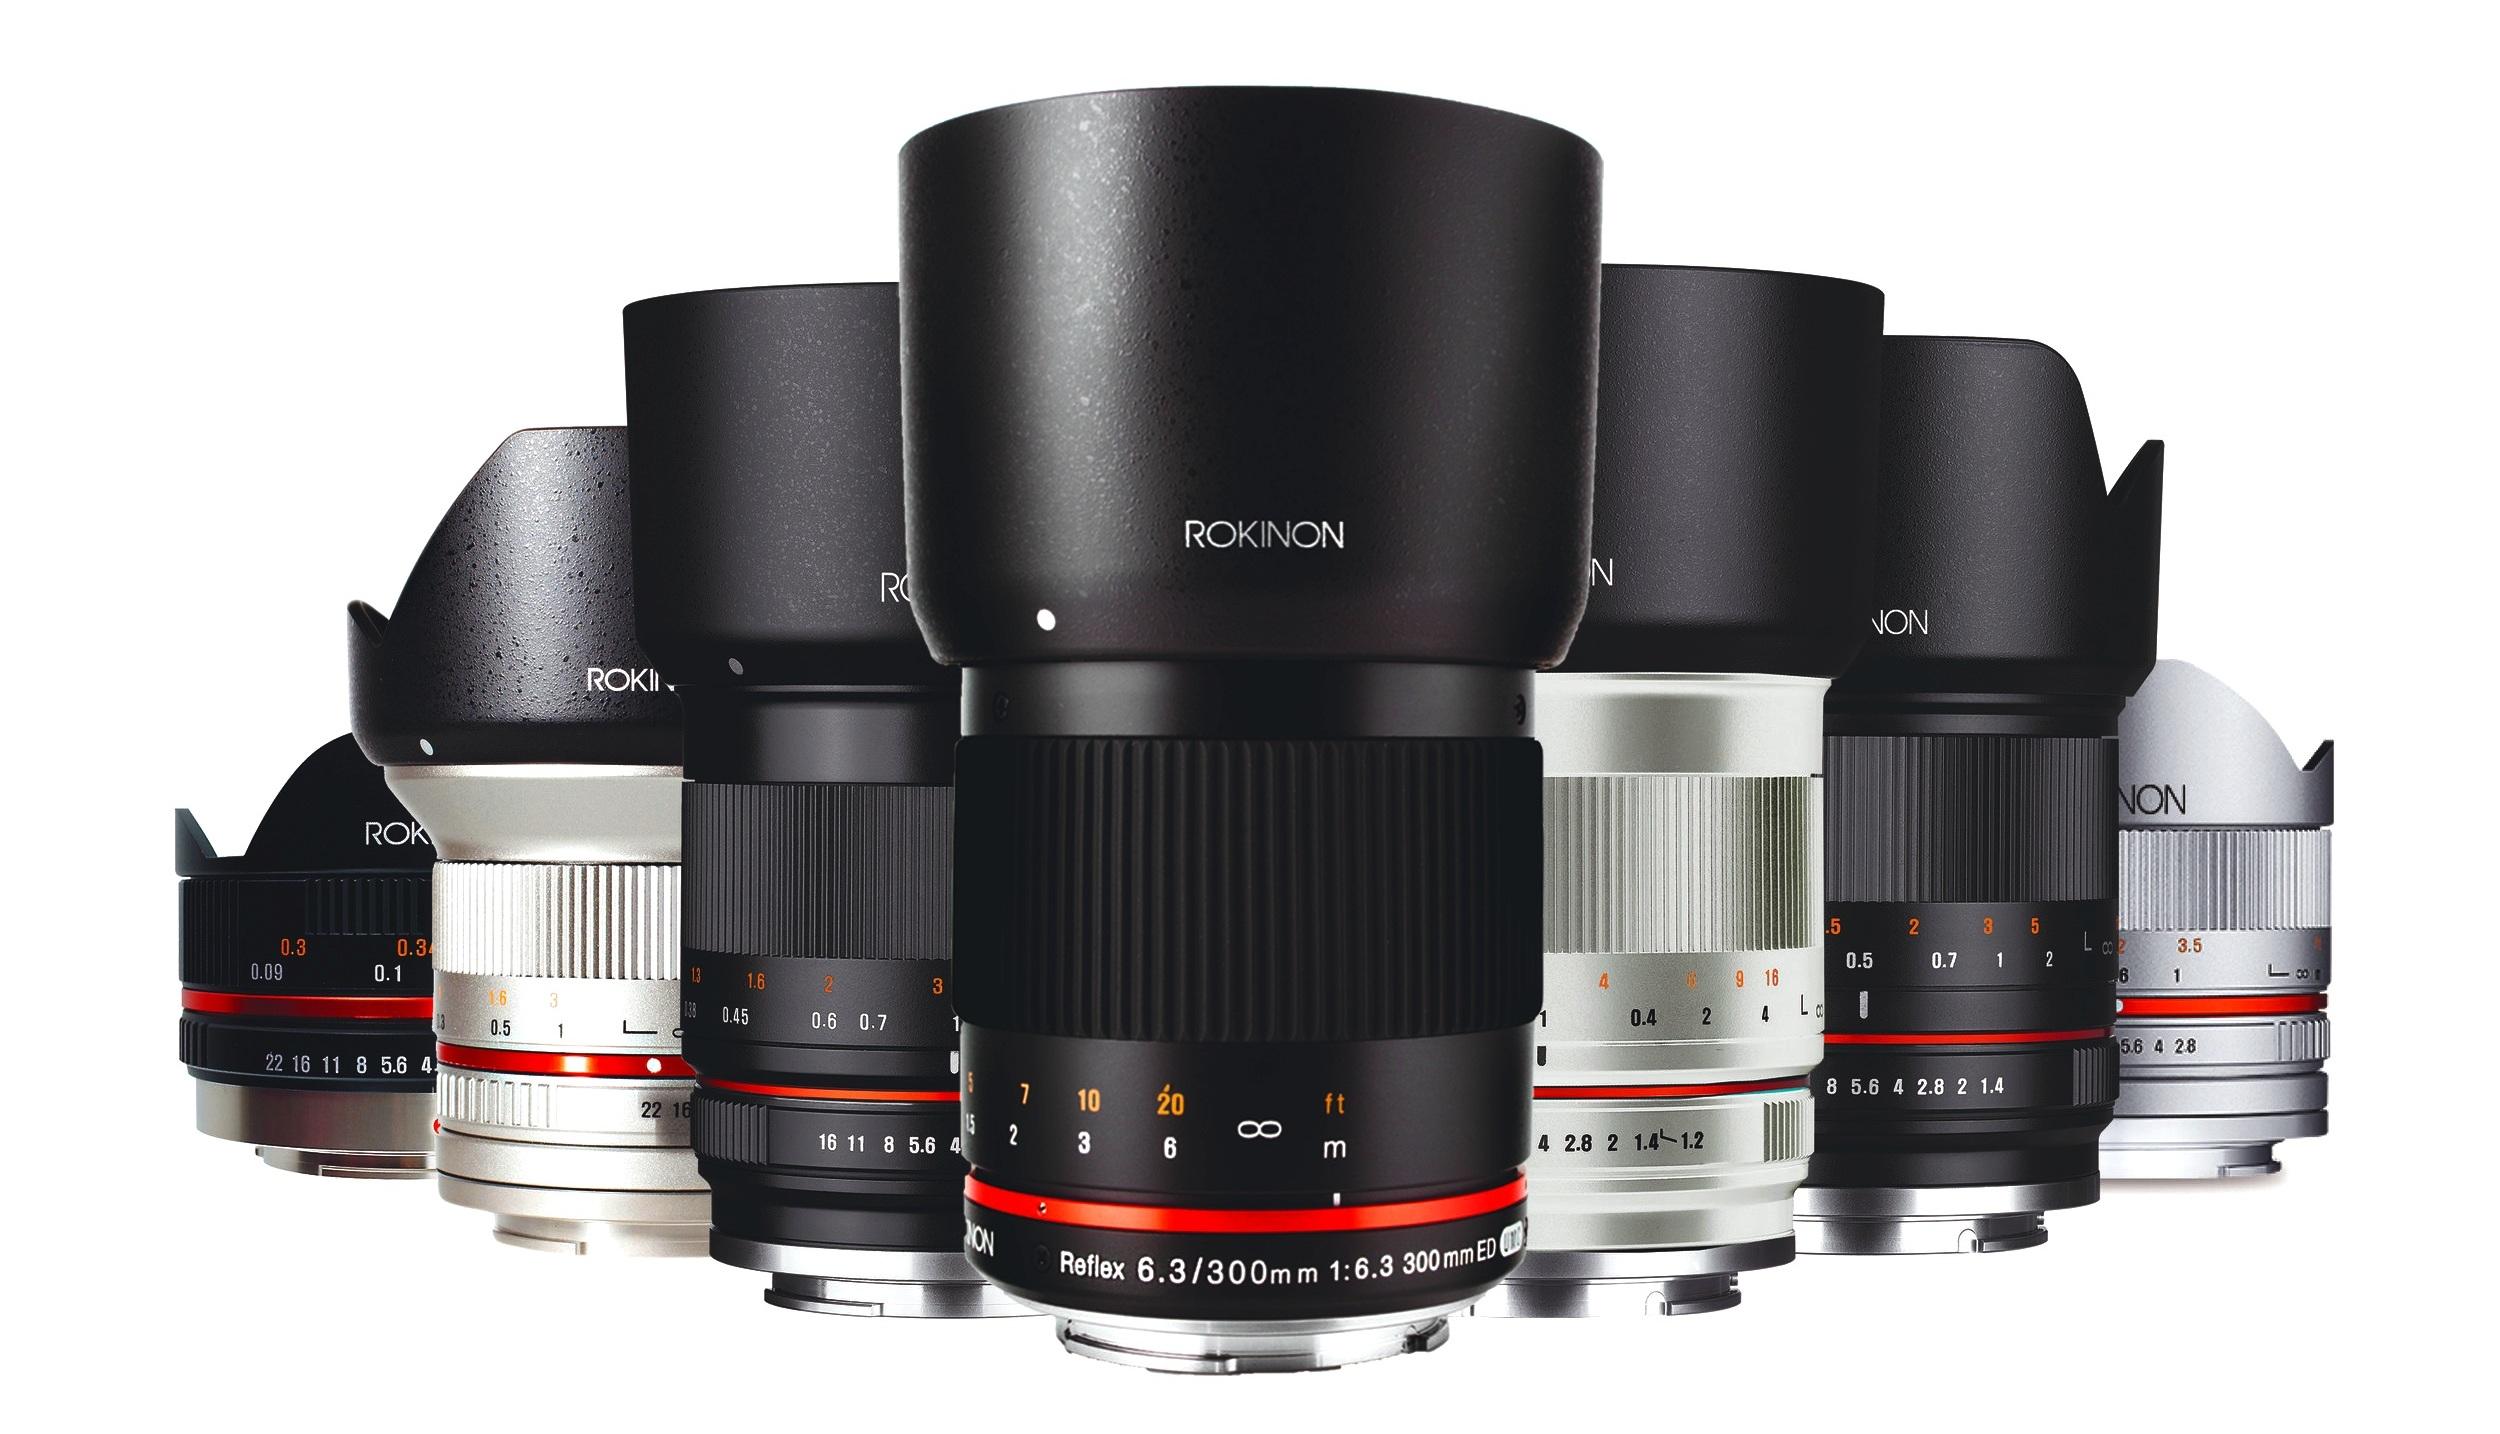 Rokinon Mirrorless Consumer Photo Lenses